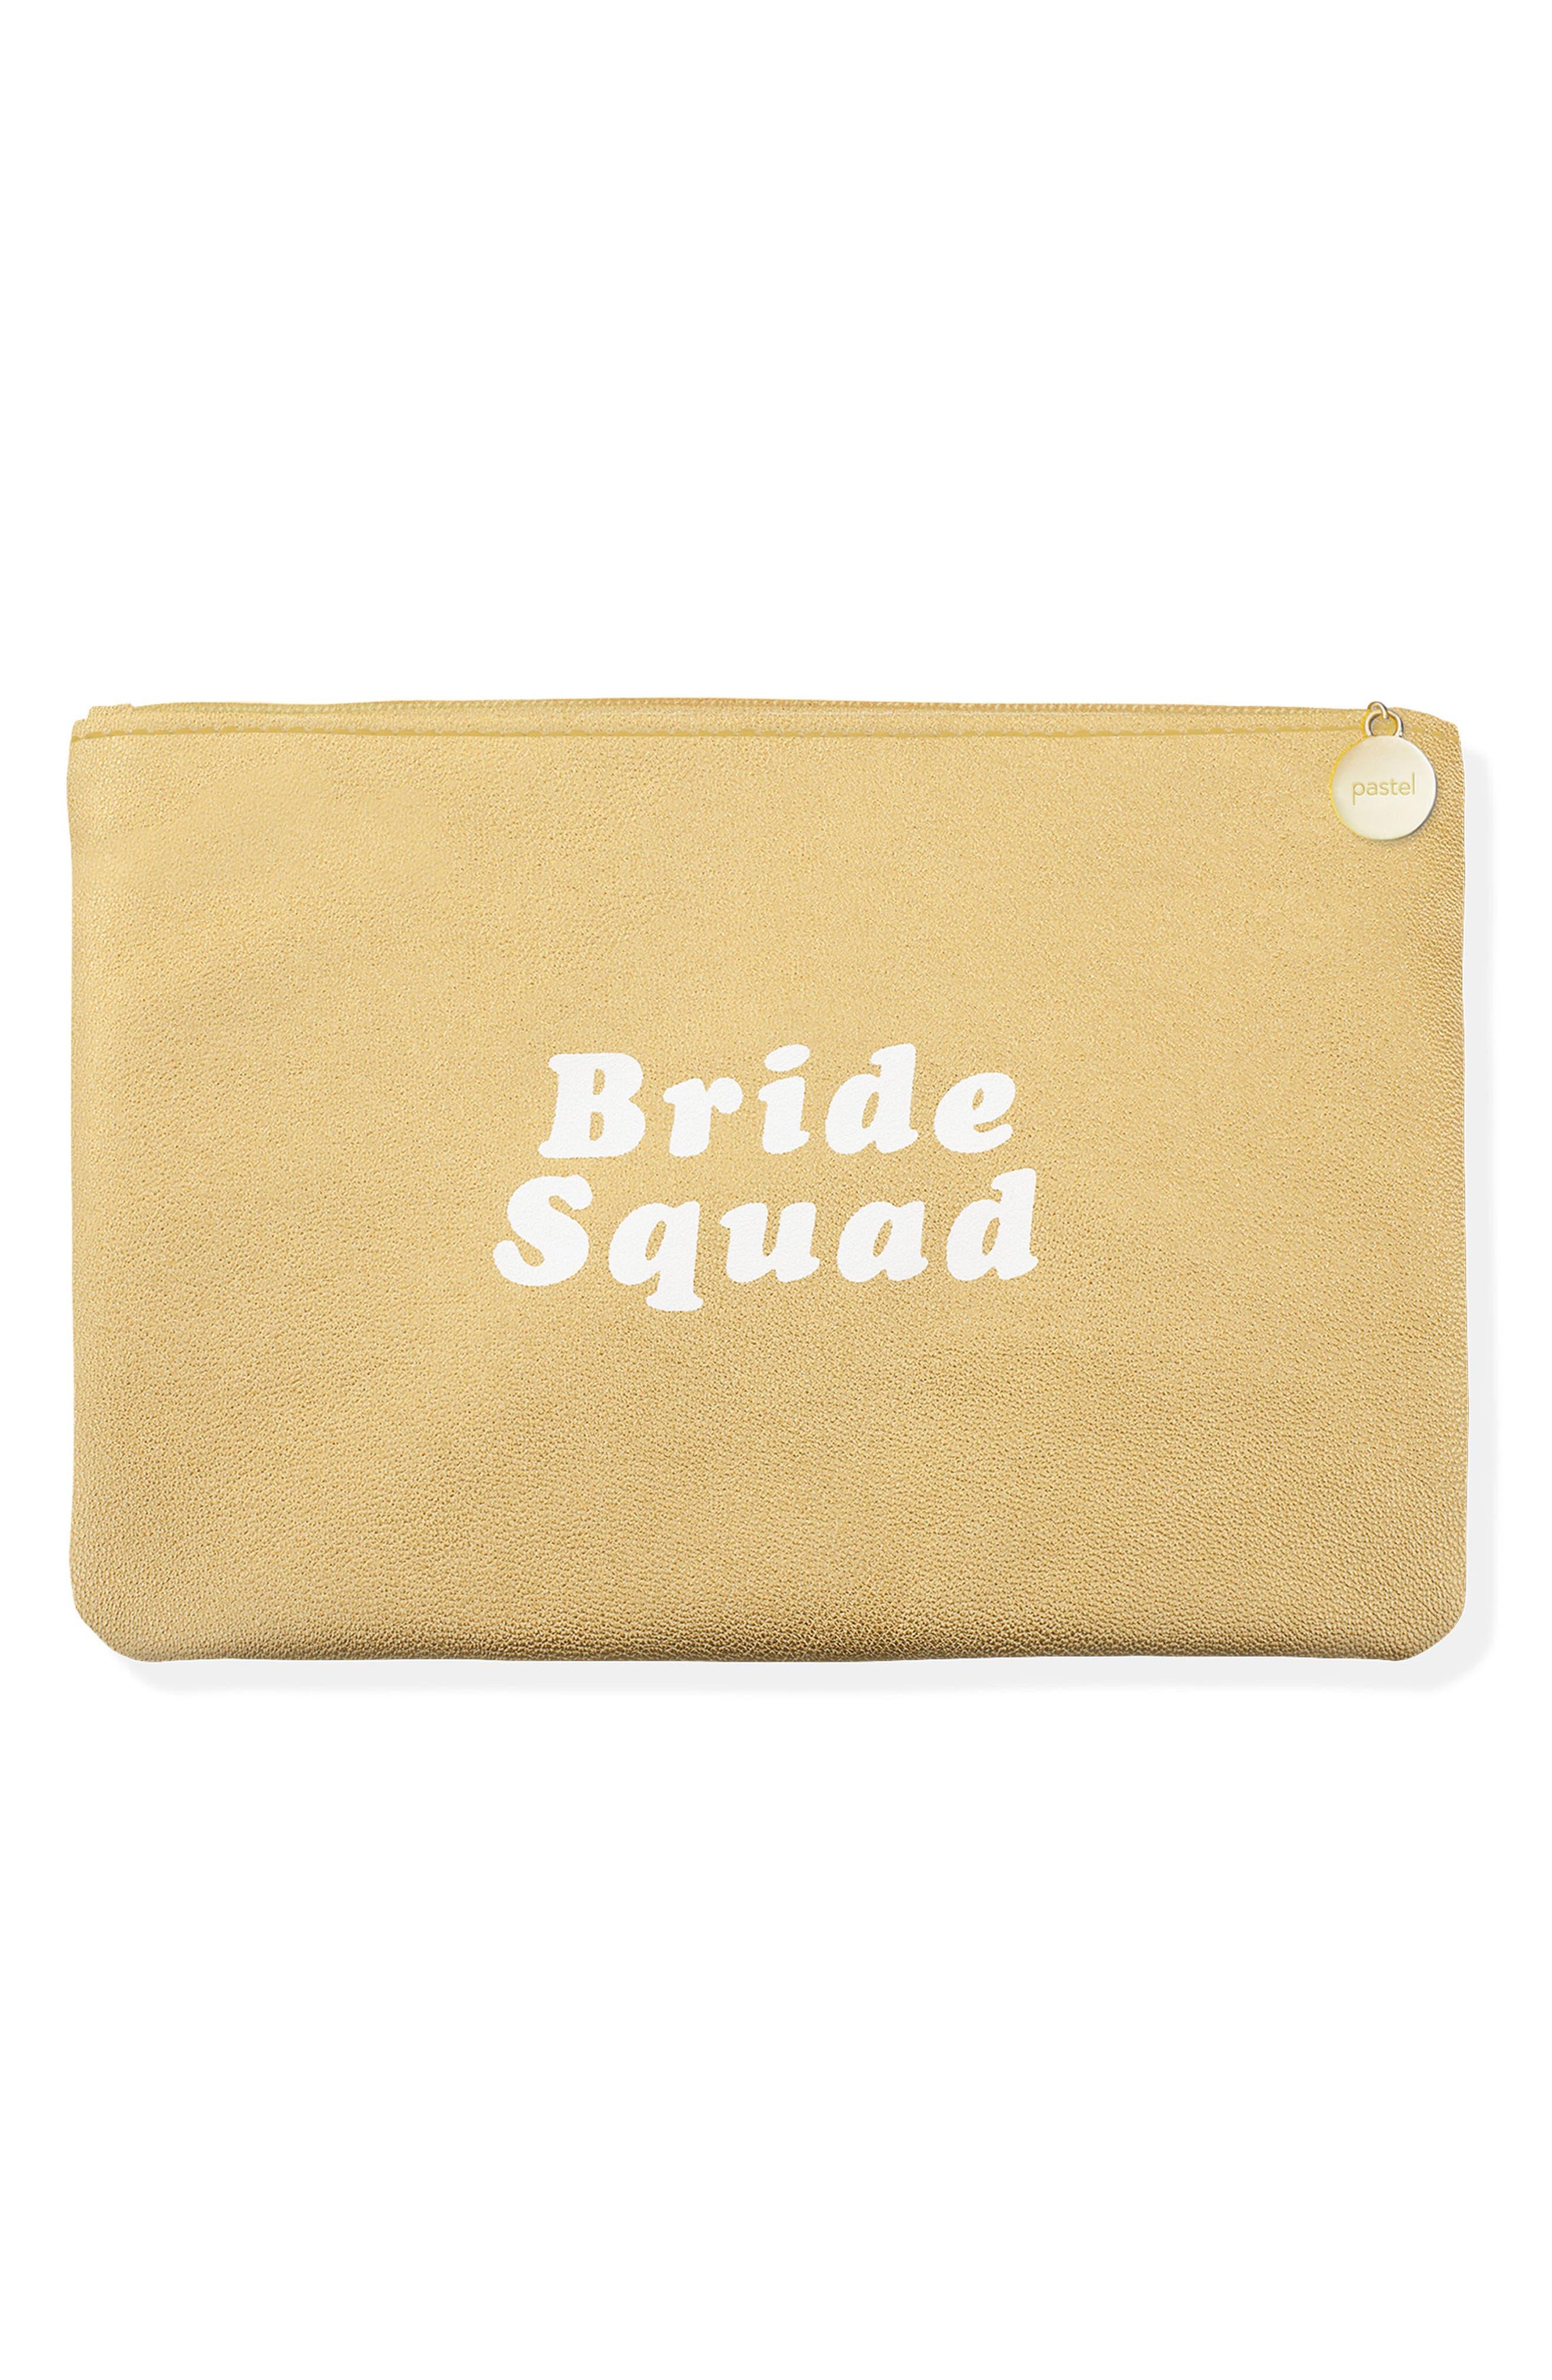 Main Image - Fringe Studio Bride Squad Zip Pouch